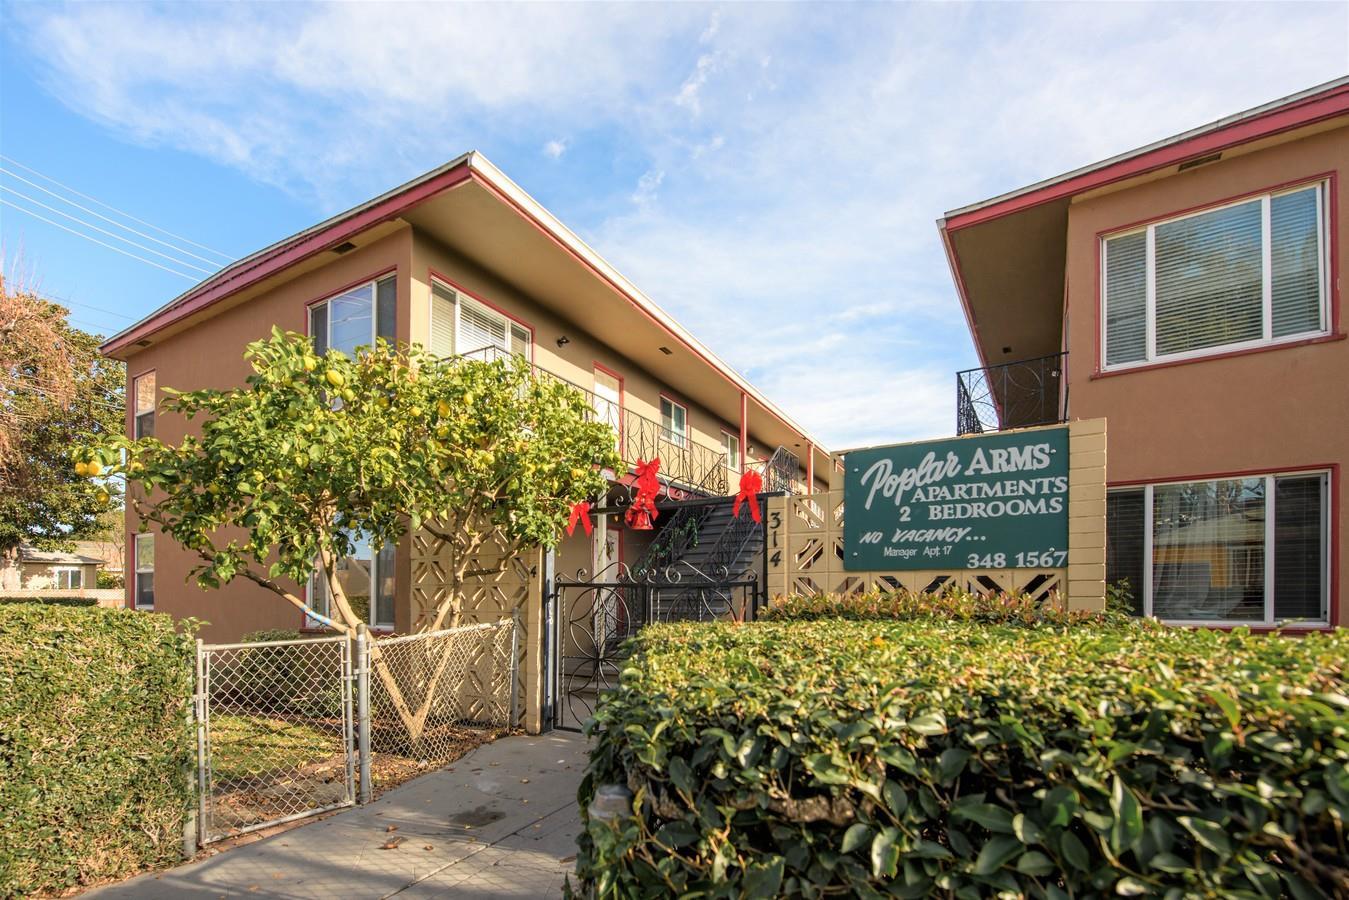 Multi-Family Home for Sale at 314 E Poplar Avenue 314 E Poplar Avenue San Mateo, California 94401 United States